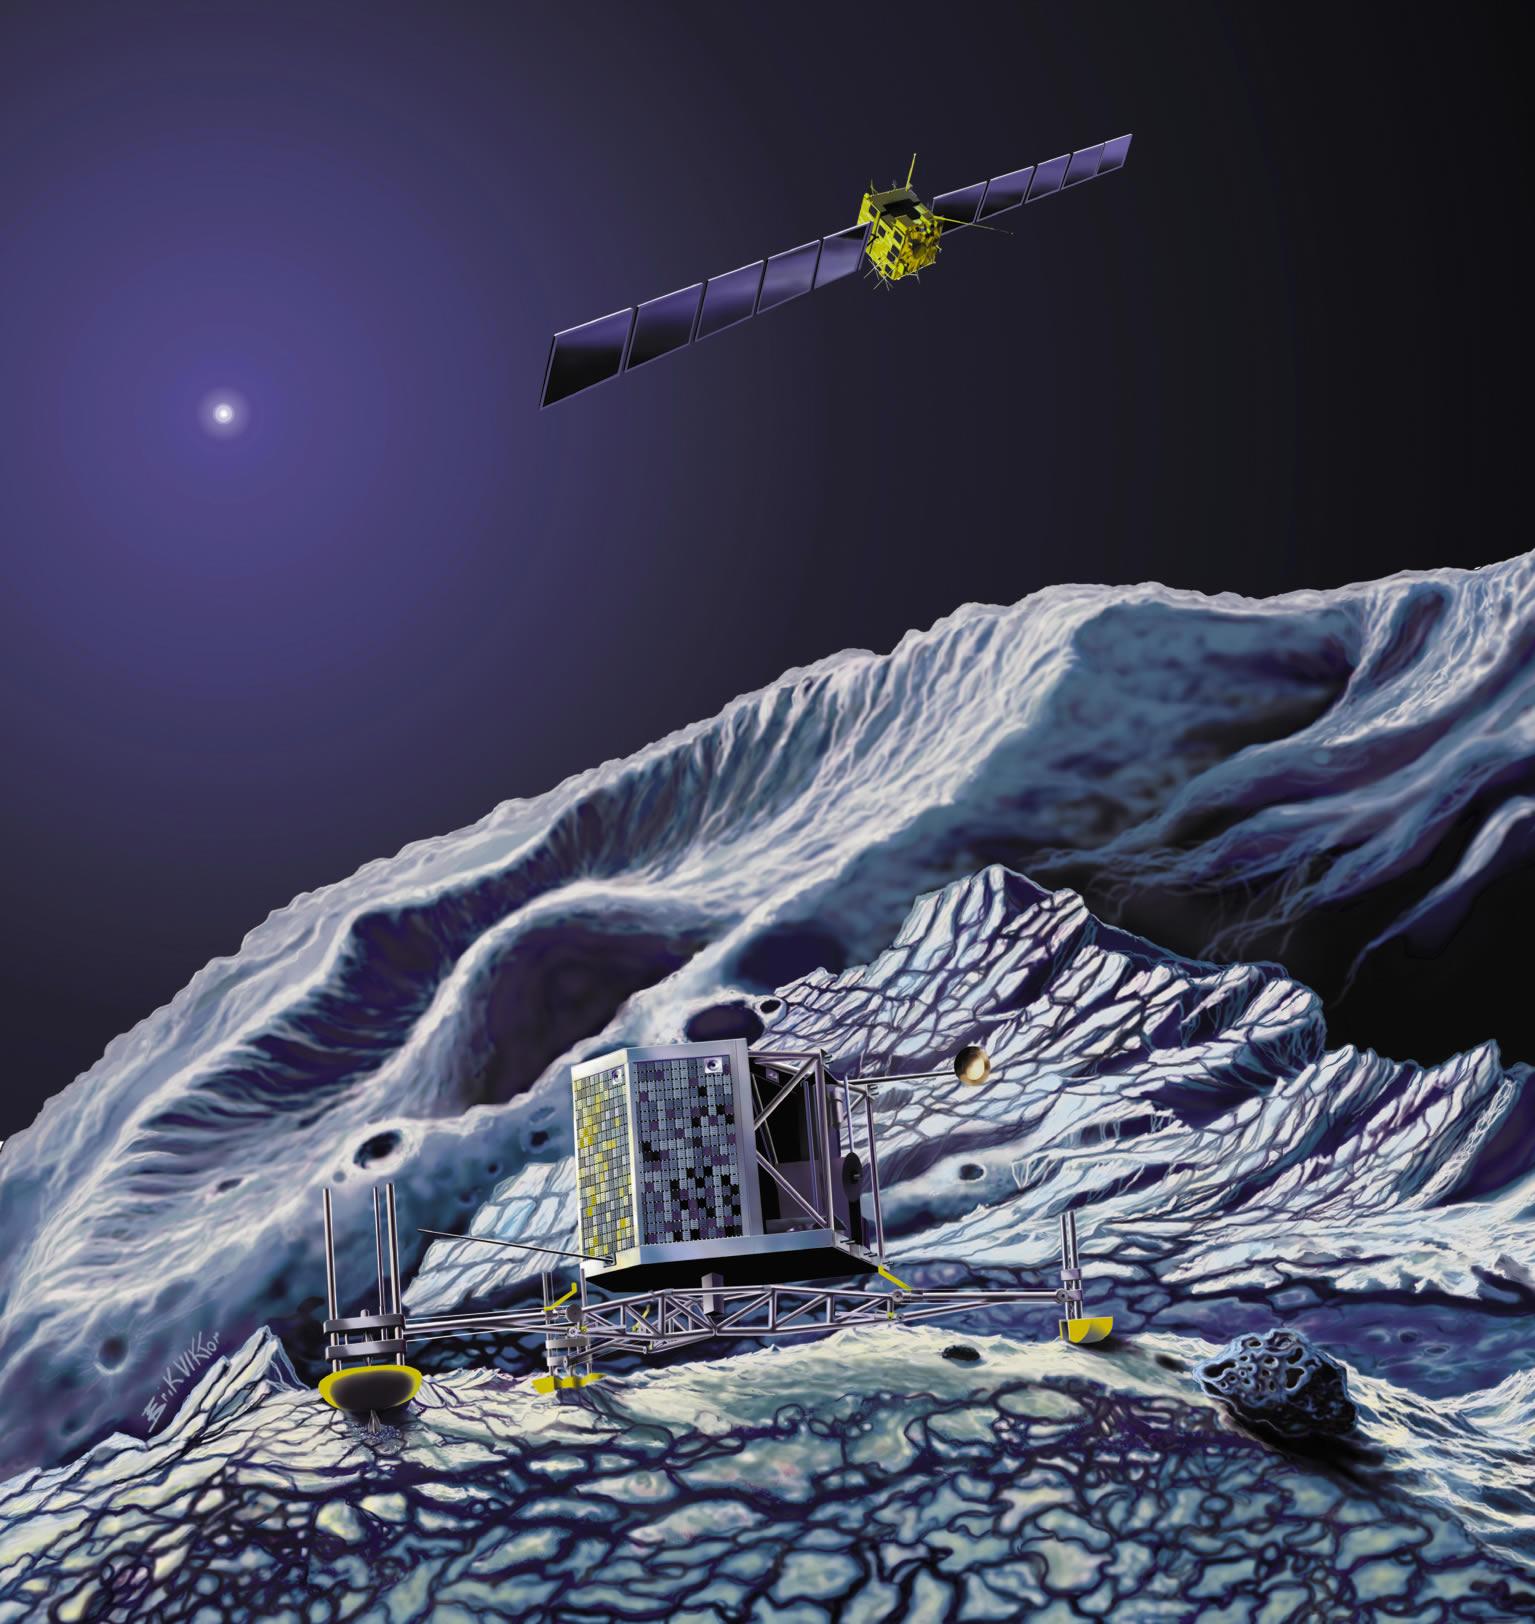 nasa comet lander name - photo #36